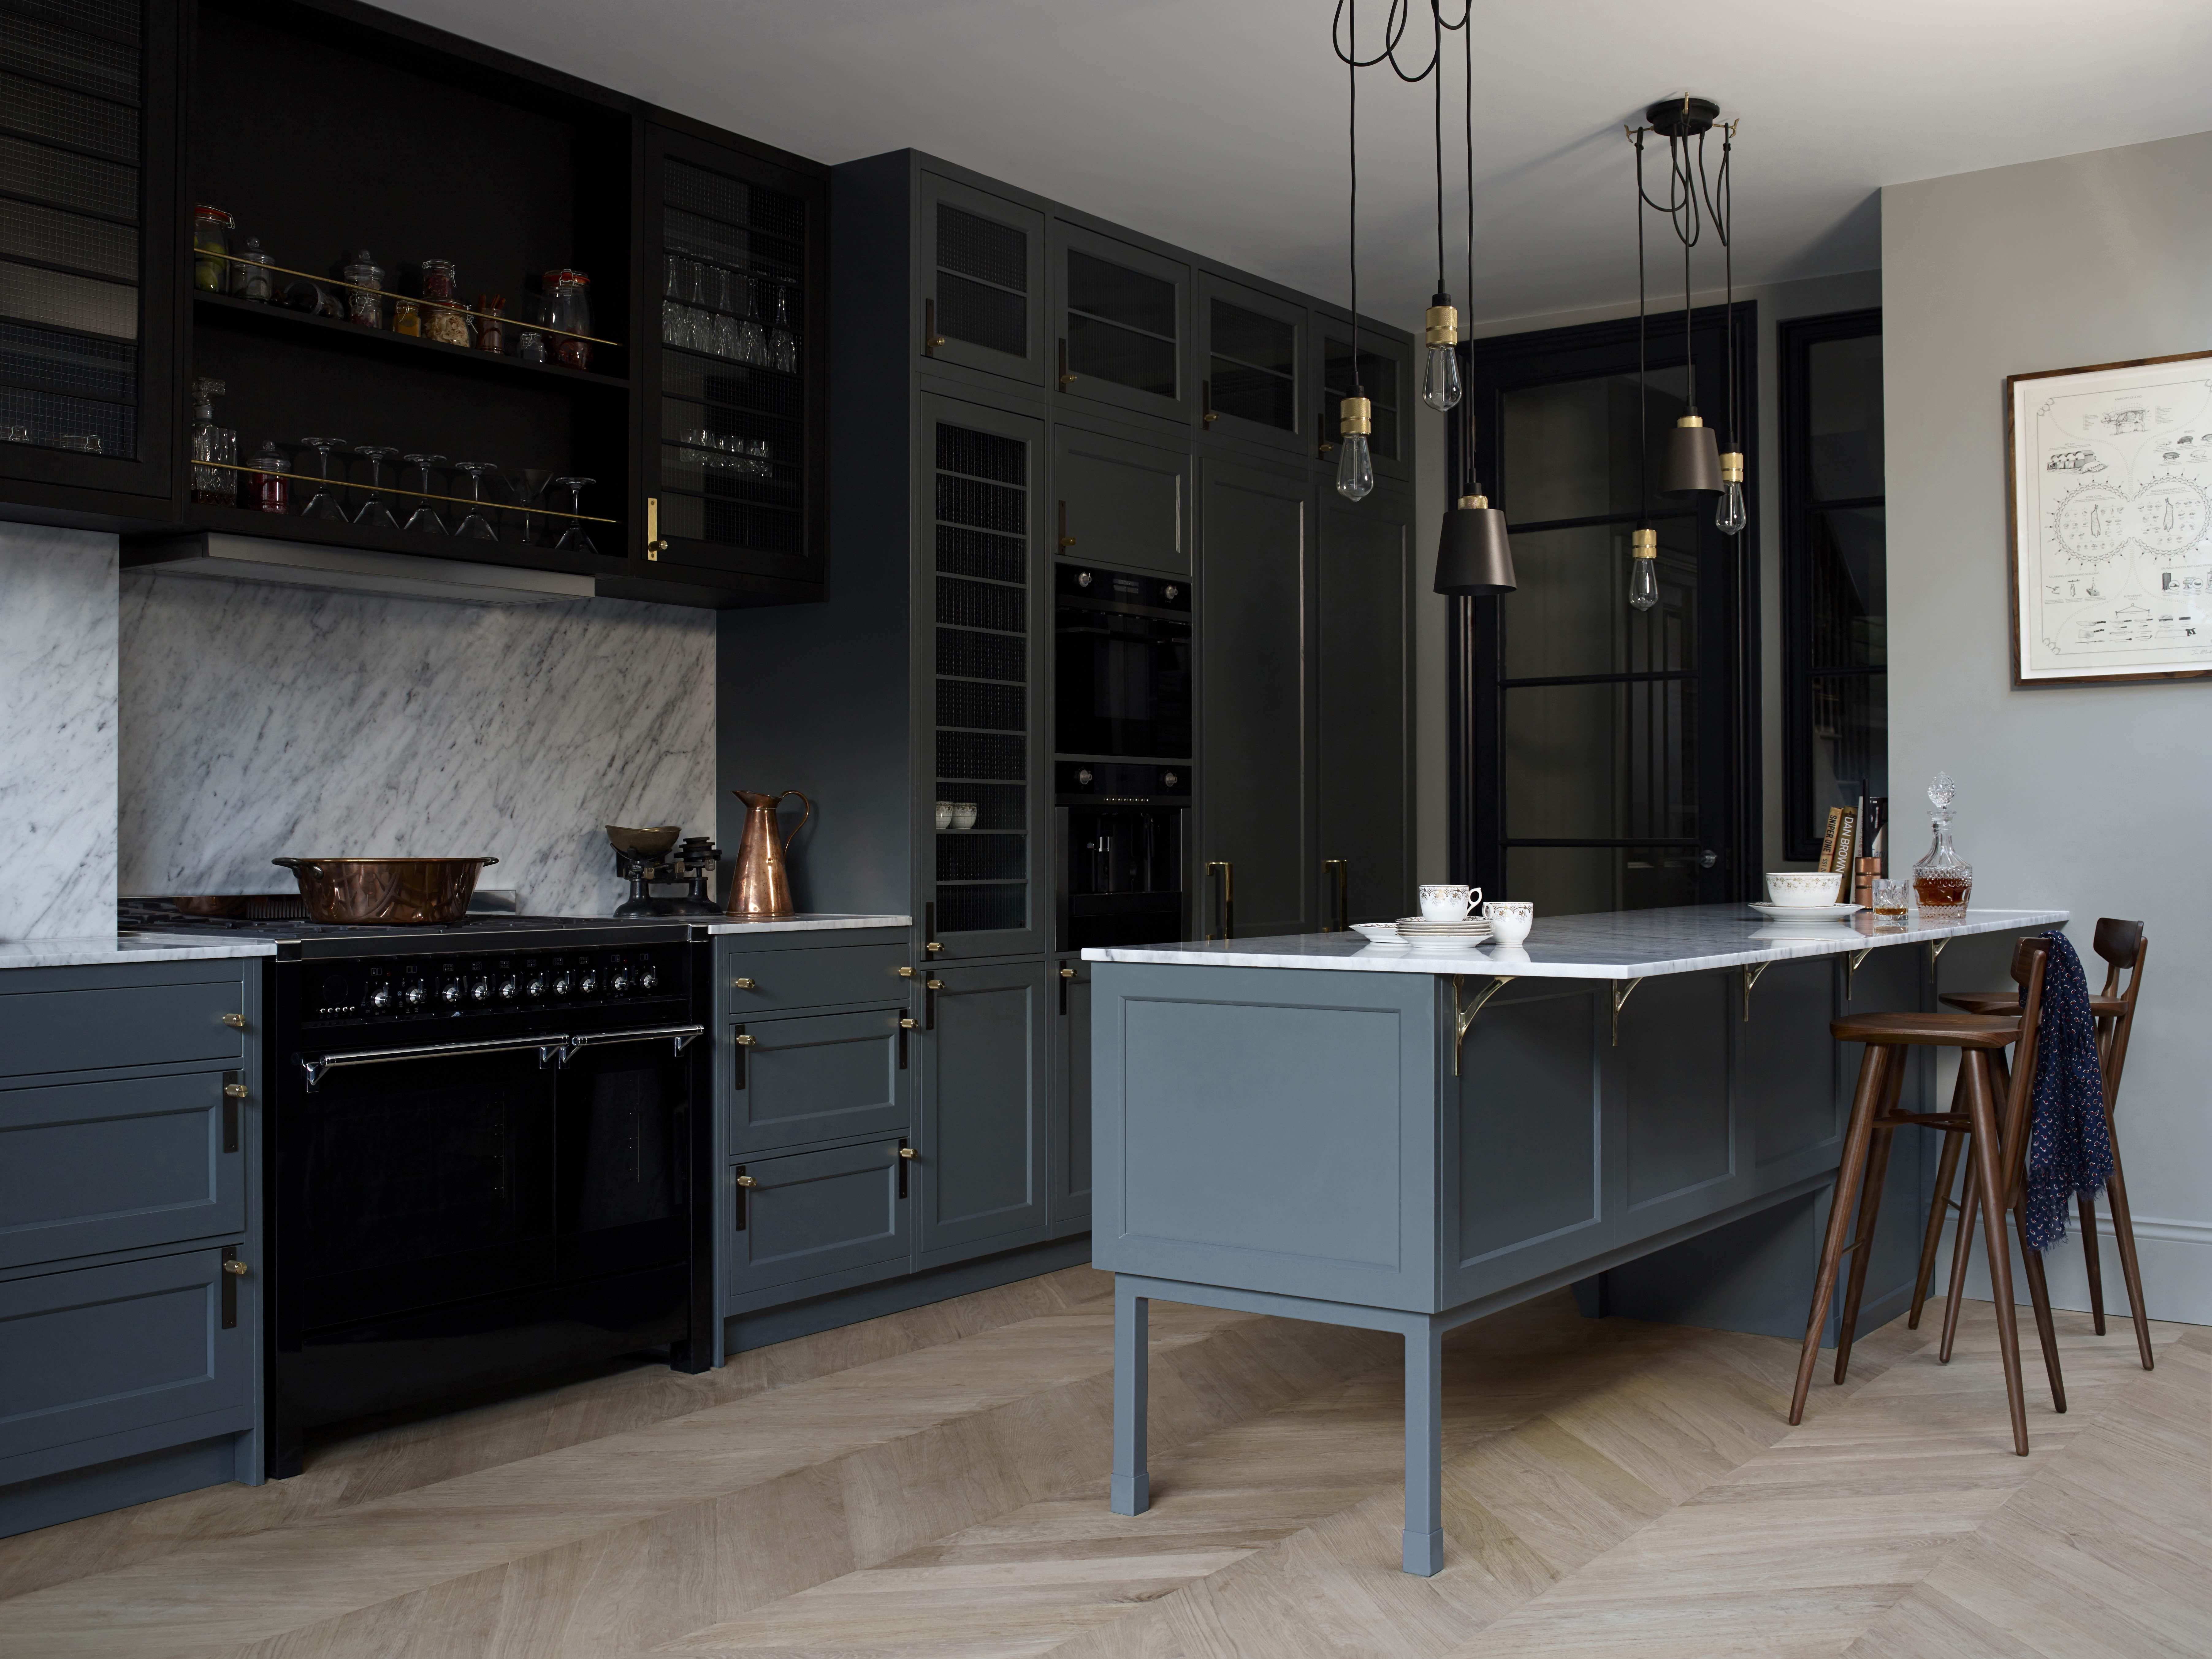 Butchers Kitchen Menu : Modern, Contemporary Lifestyle Inspiration - Buster + Punch - The Butcher?s Kitchen